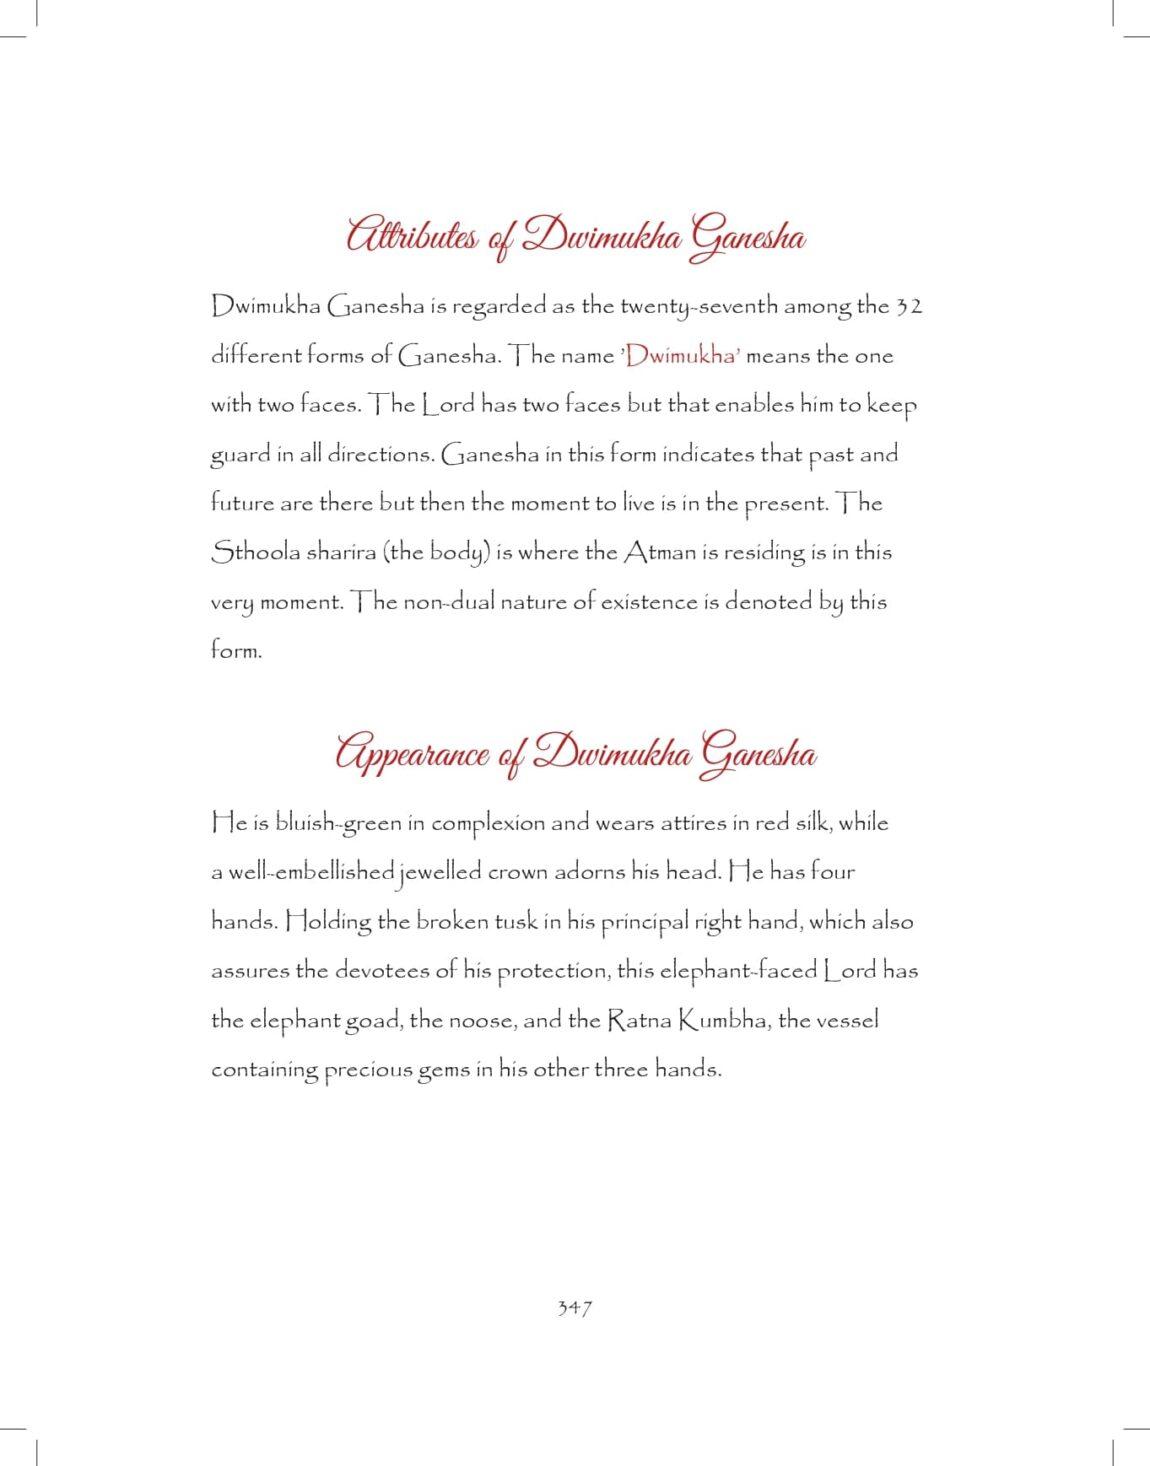 Ganesh-print_pages-to-jpg-0347.jpg